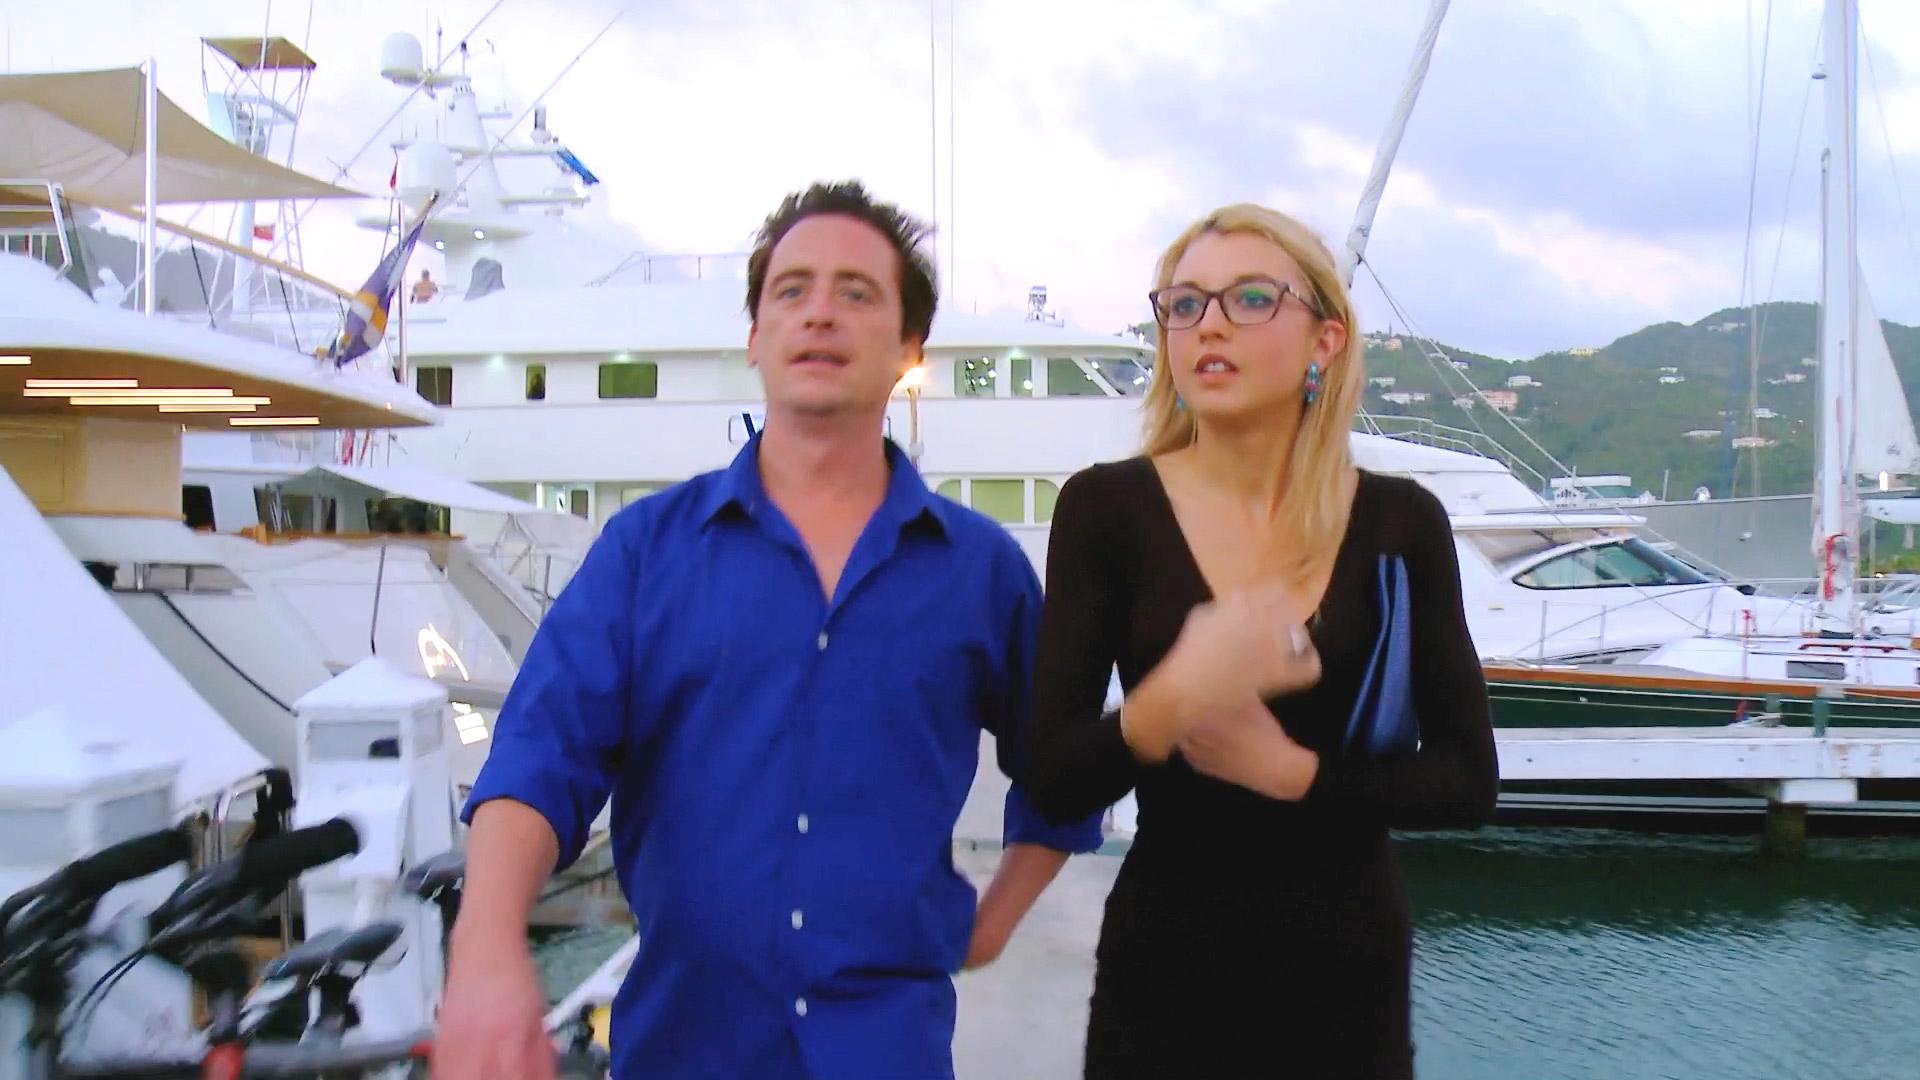 Below Deck's Ben Robinson and Emily Warburton-Adams Reunite